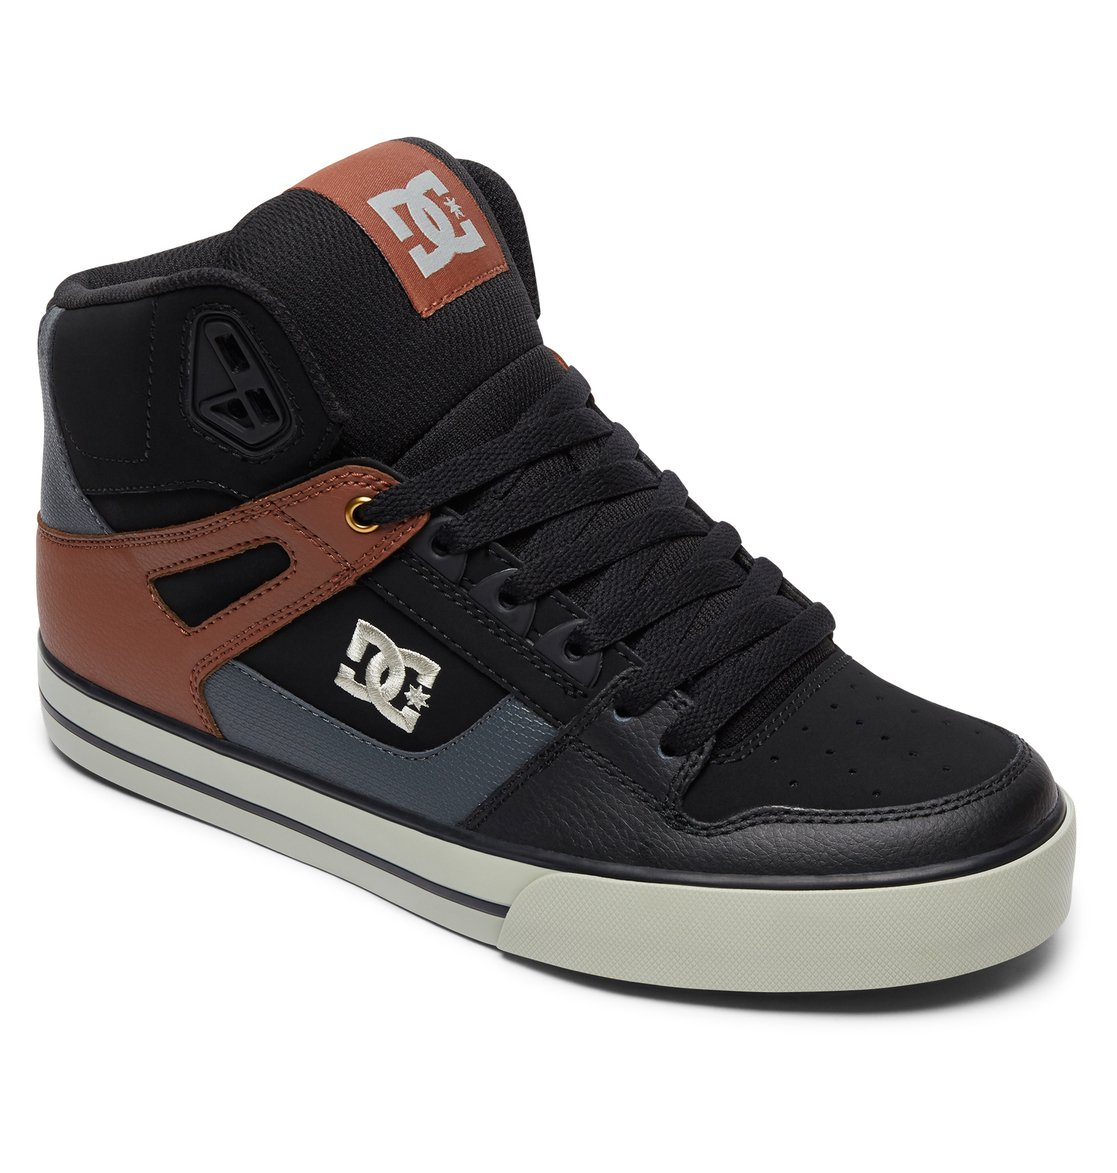 DC Shoes Spartan High WC - High-Top Shoes - Zapatillas - Hombre - EU 40 OLGQdT